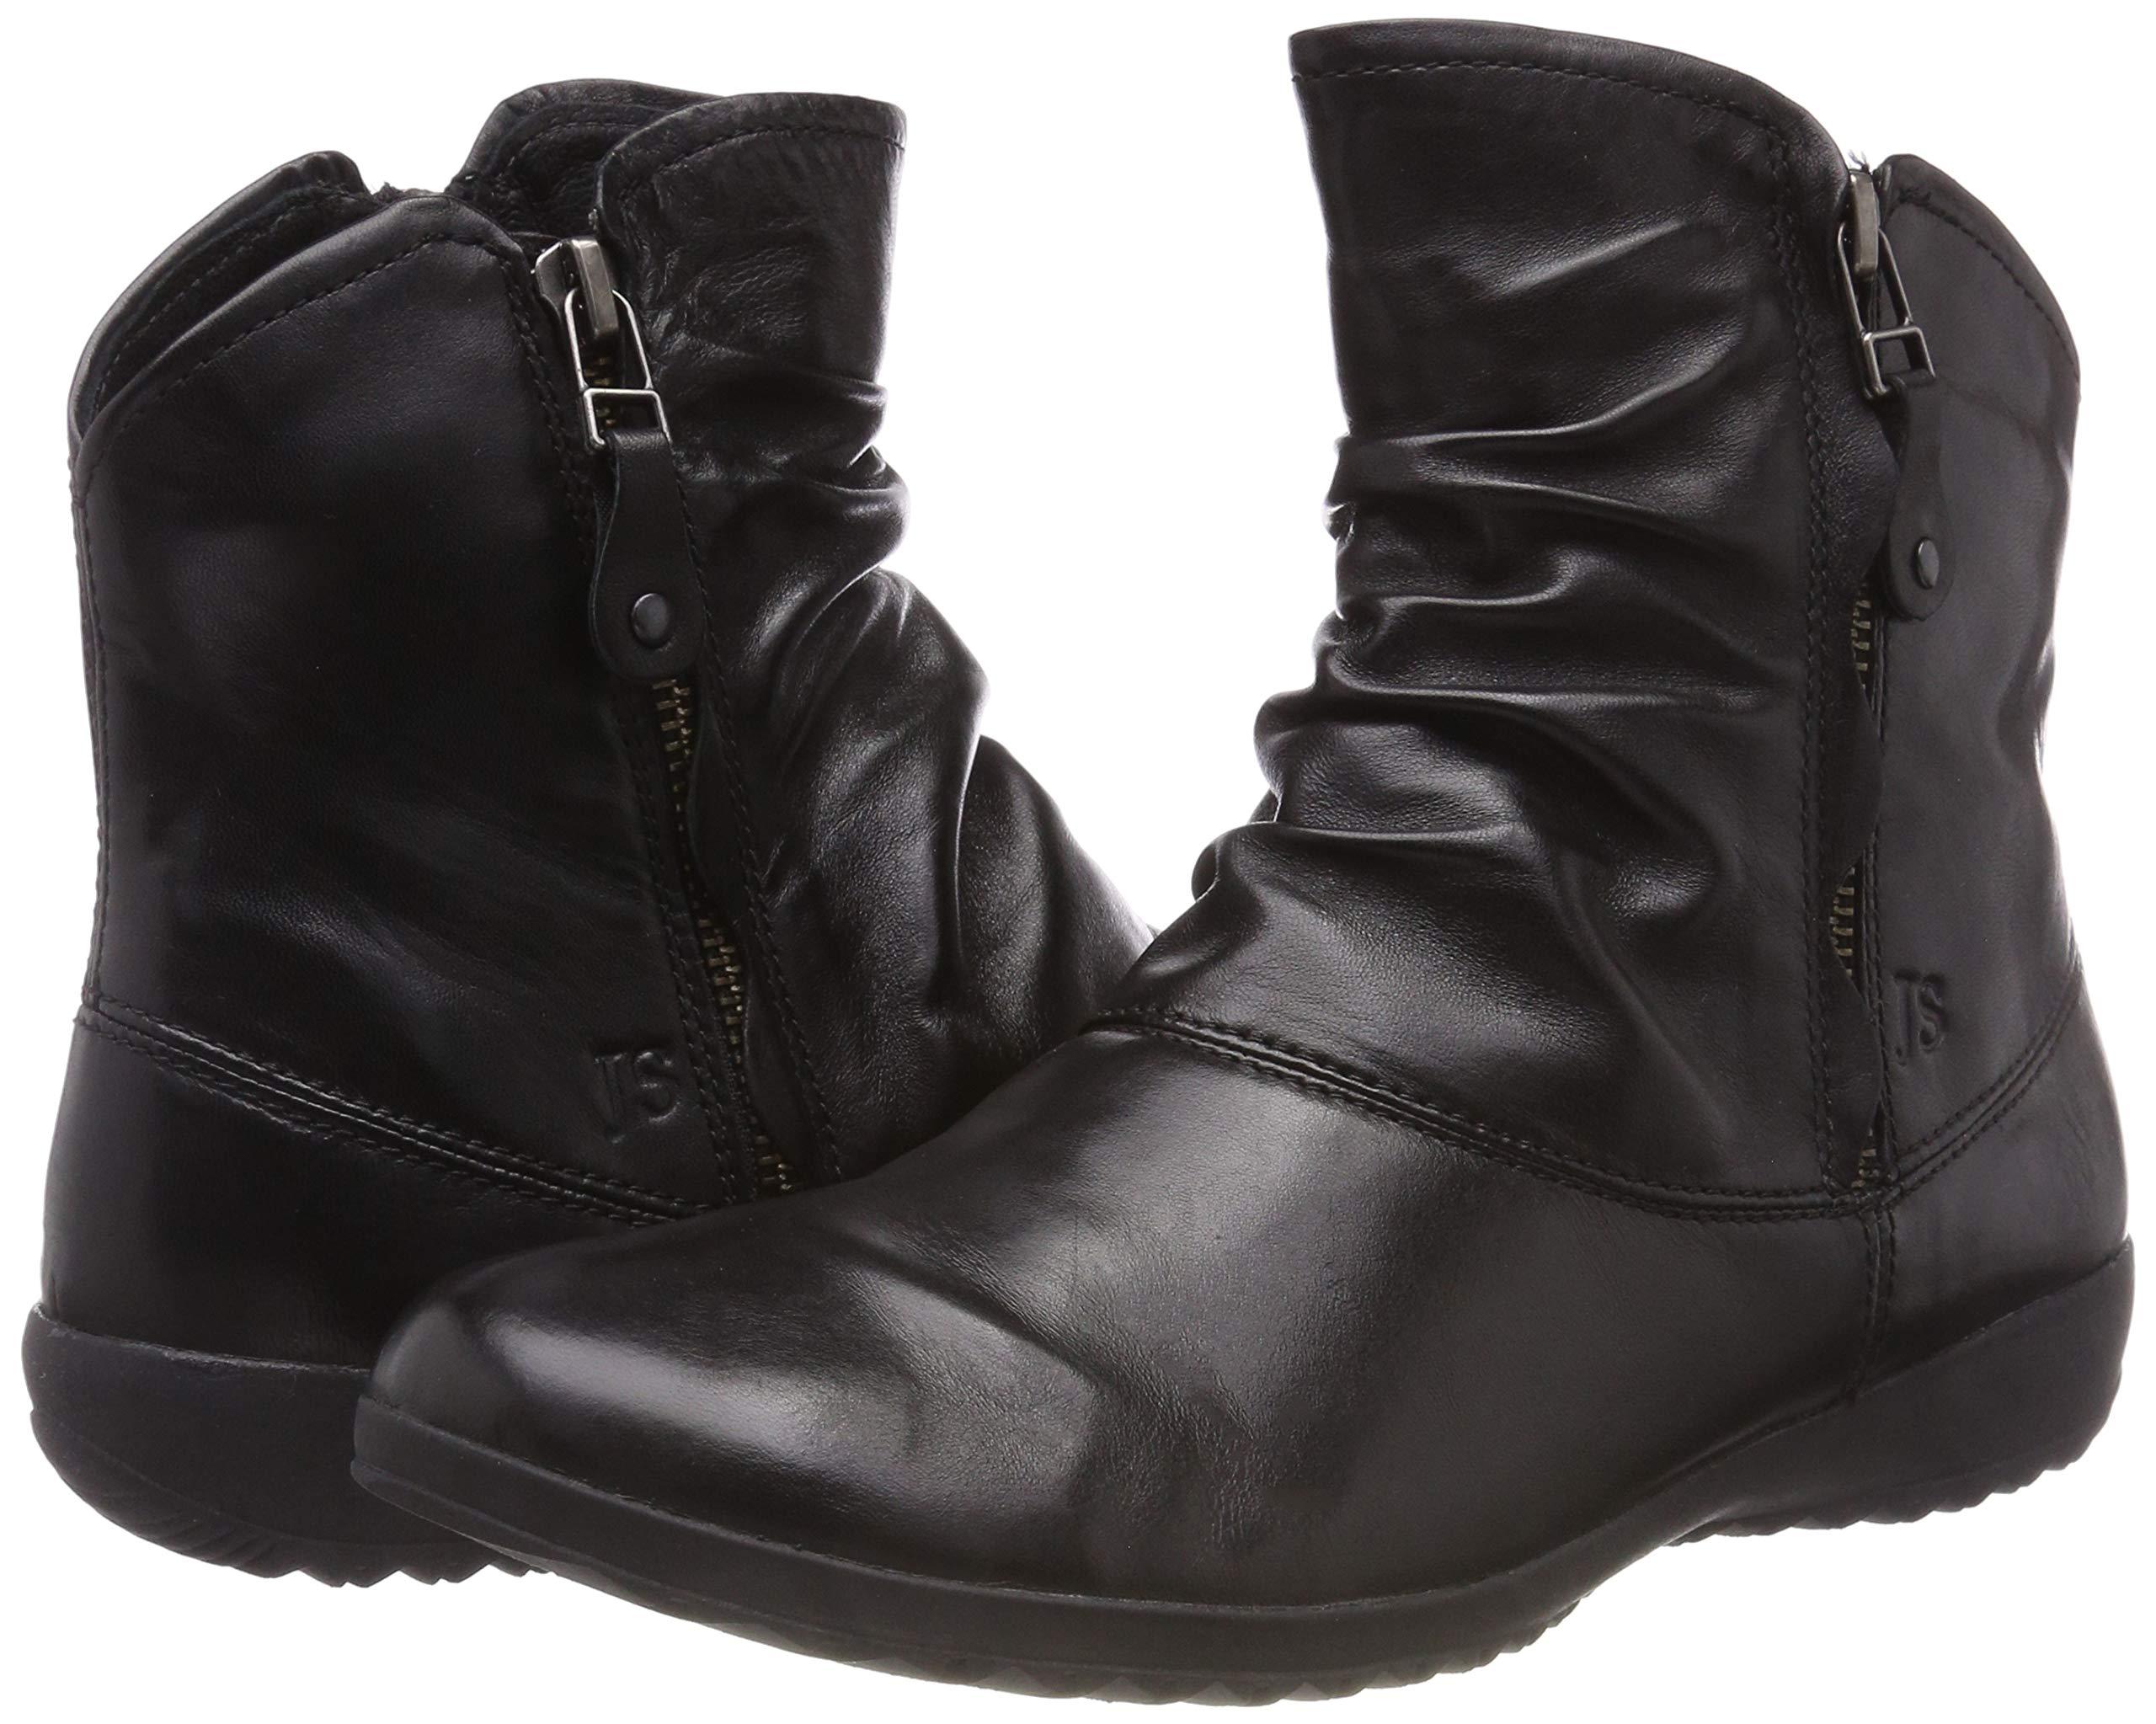 Josef Seibel Women's Naly 24 Slouch Boots 5